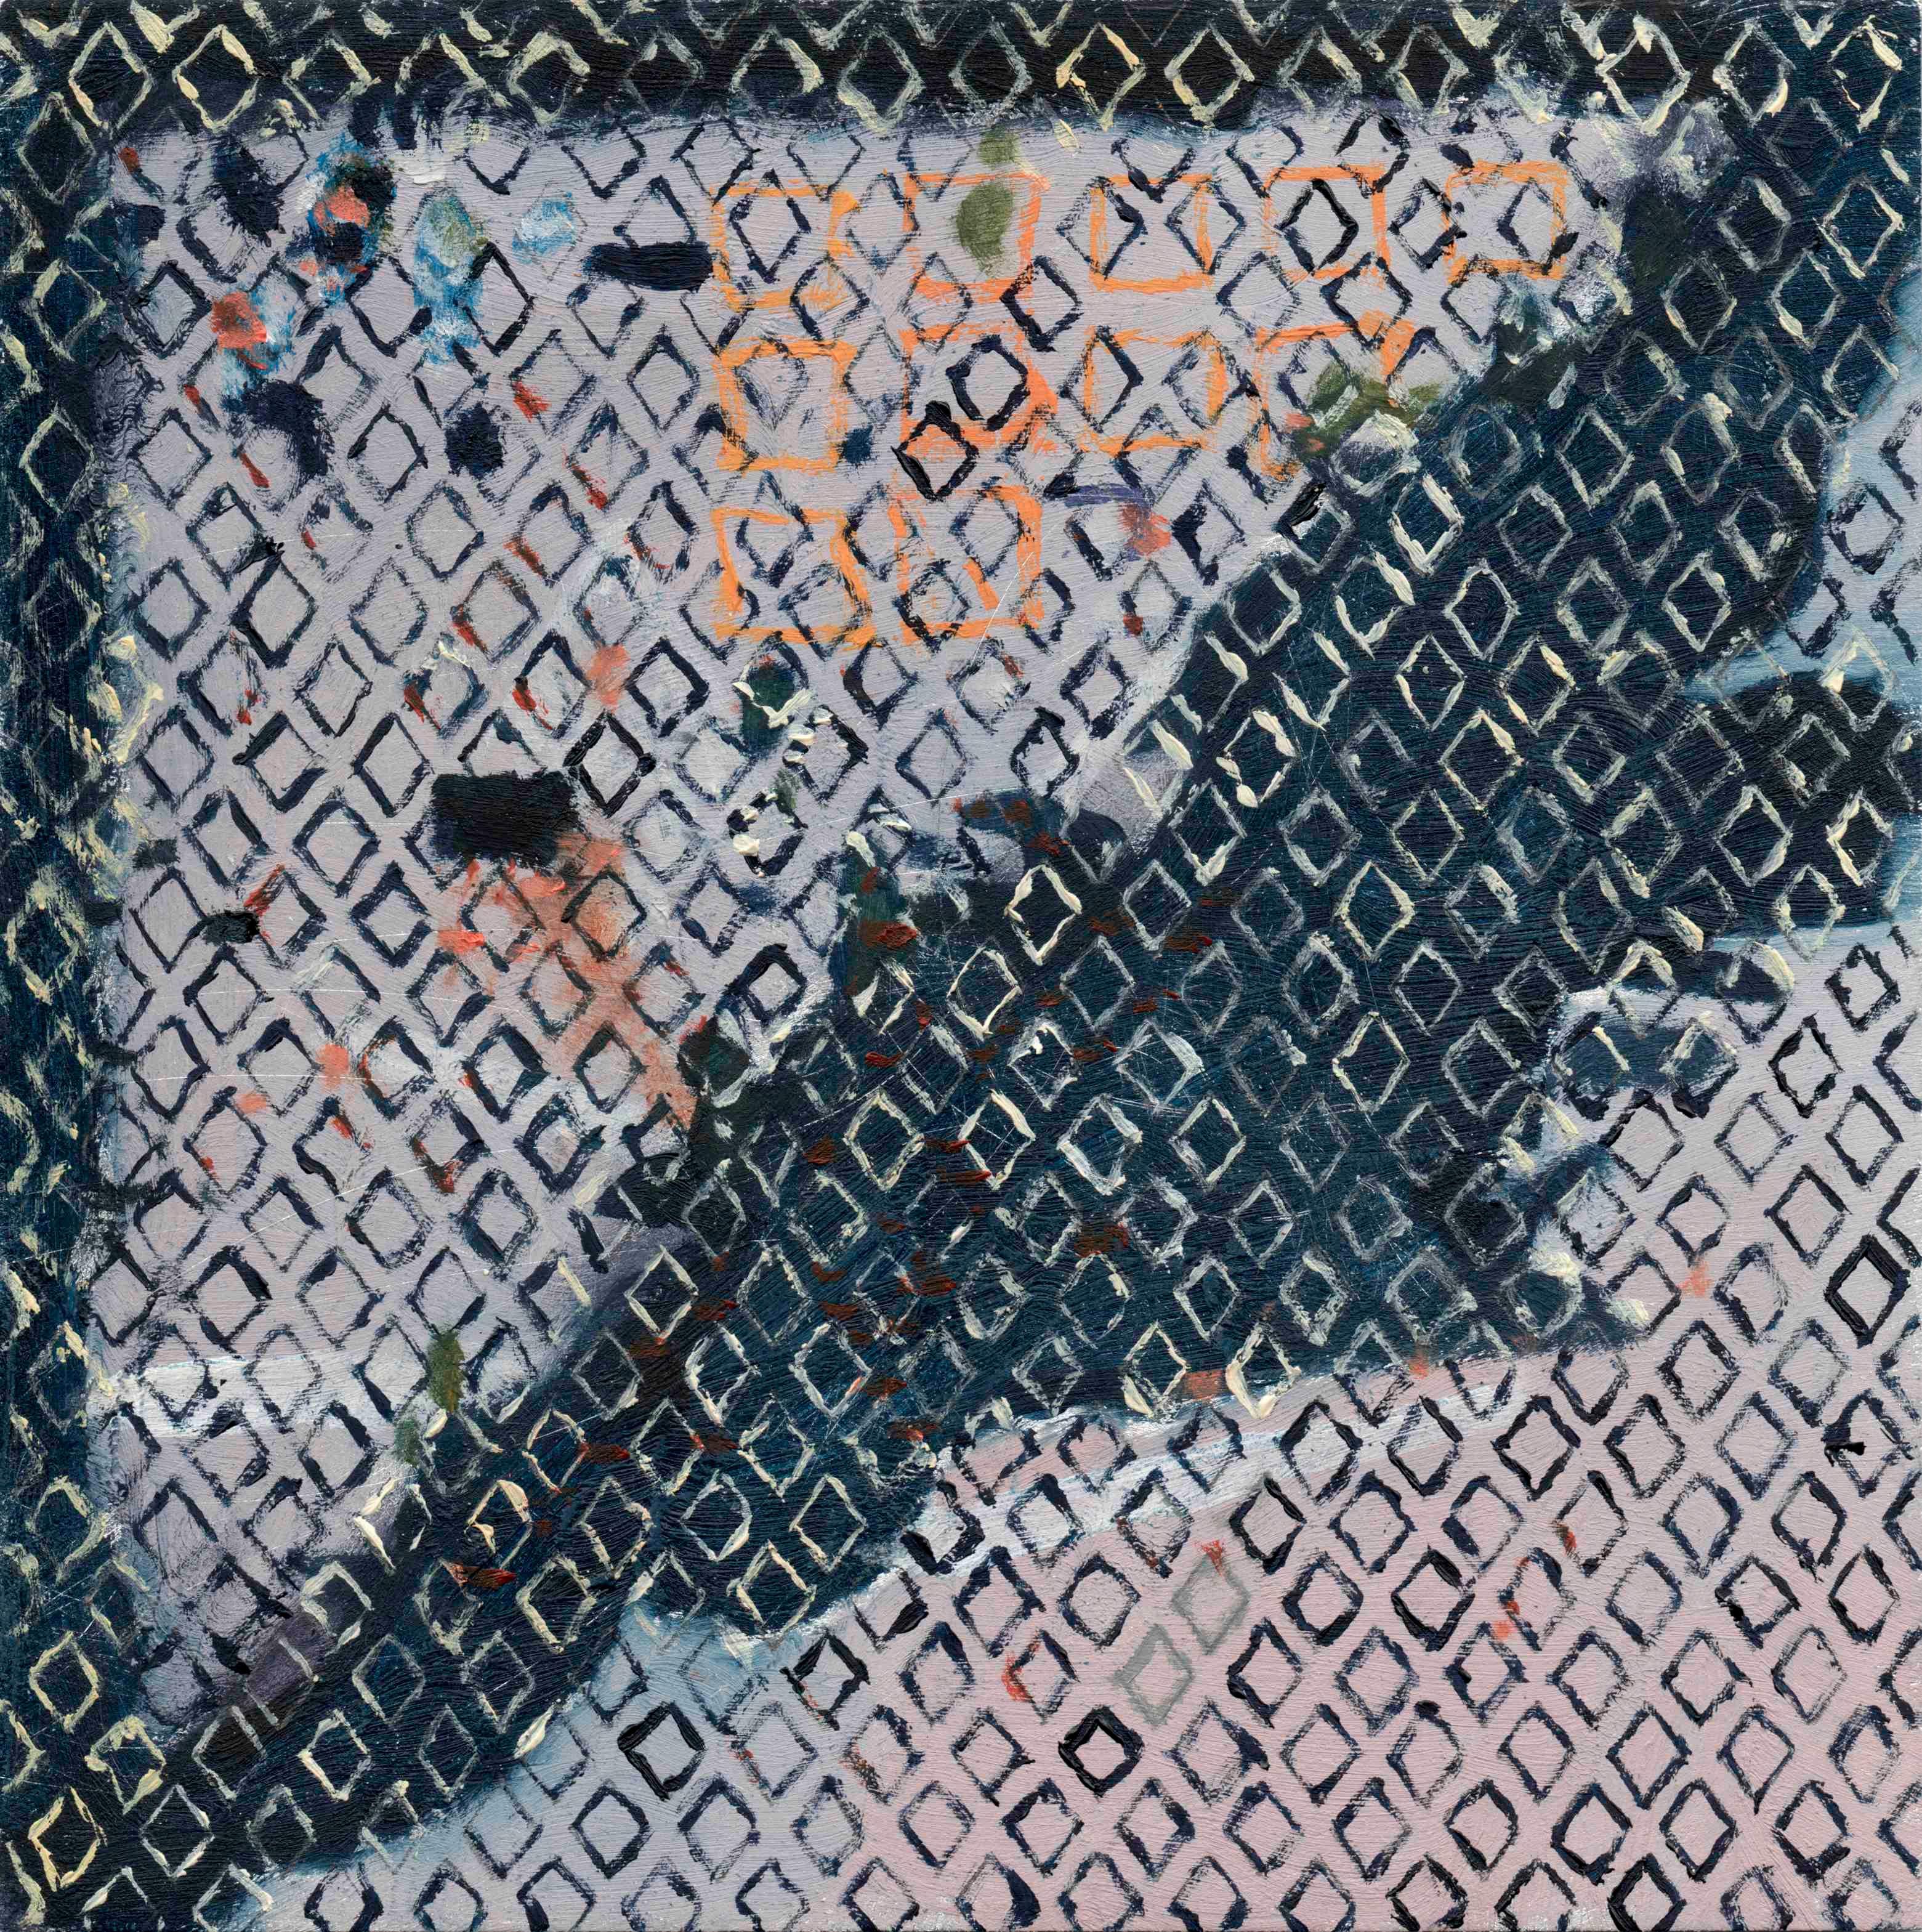 Impediments | Óleo sobre aluminio | 10 x 10 cm | 2015